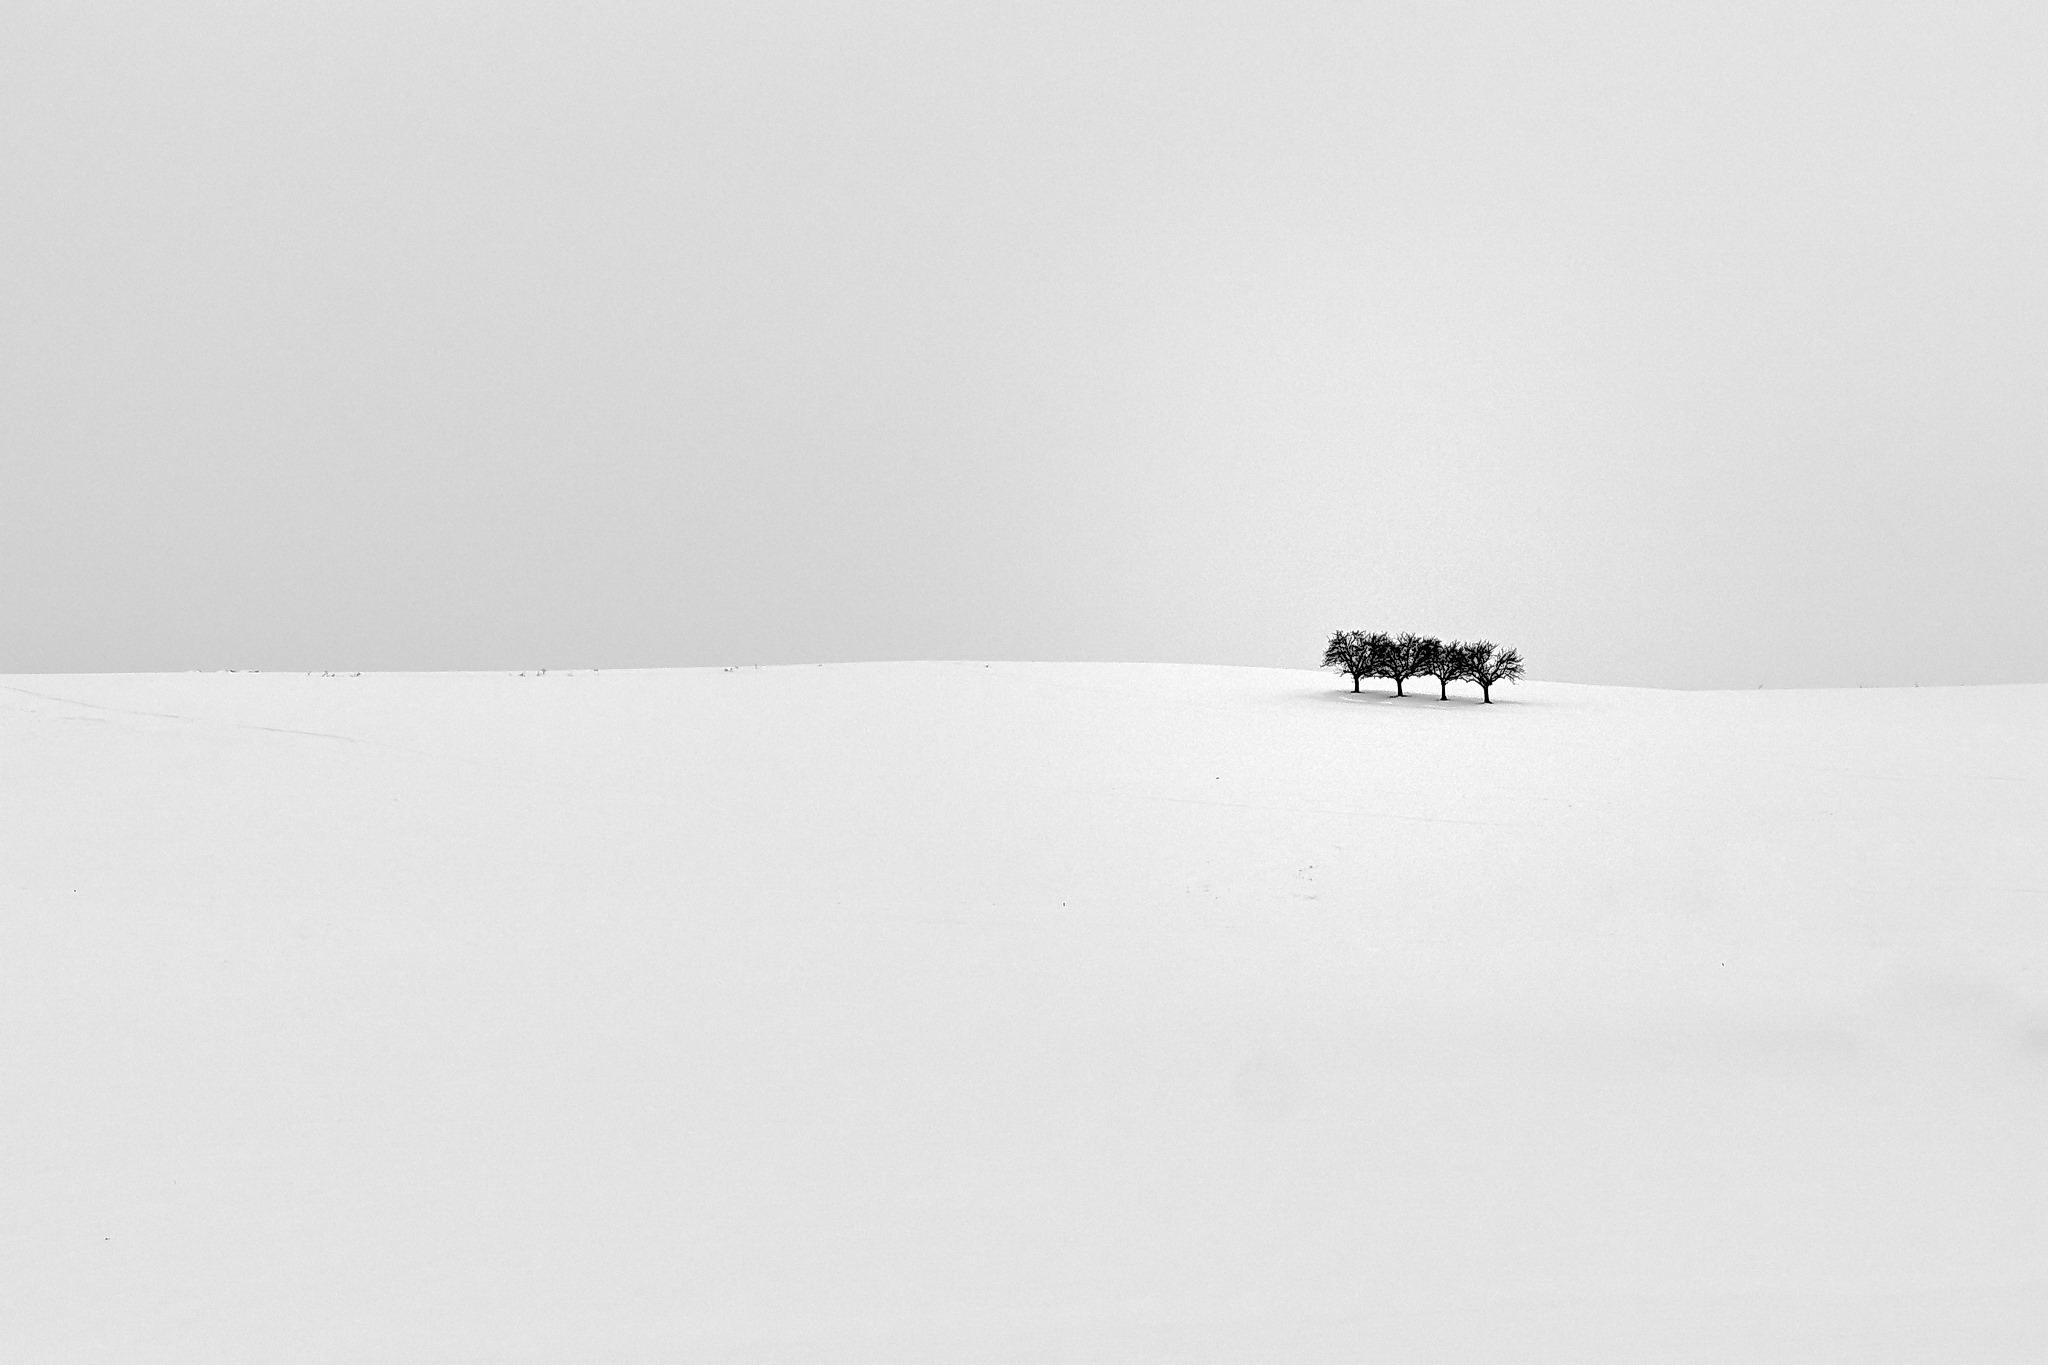 Stefan Bäurle - Landscape Photography